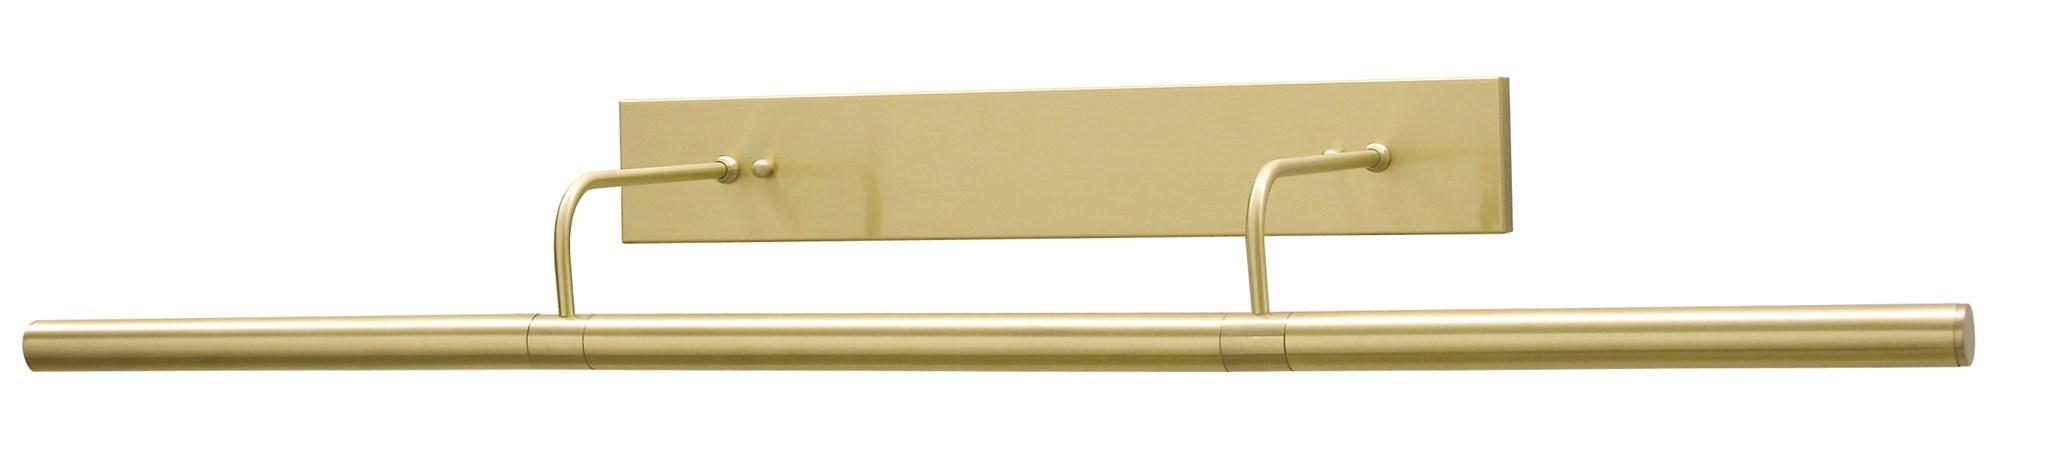 Slim-Line DSL36-51